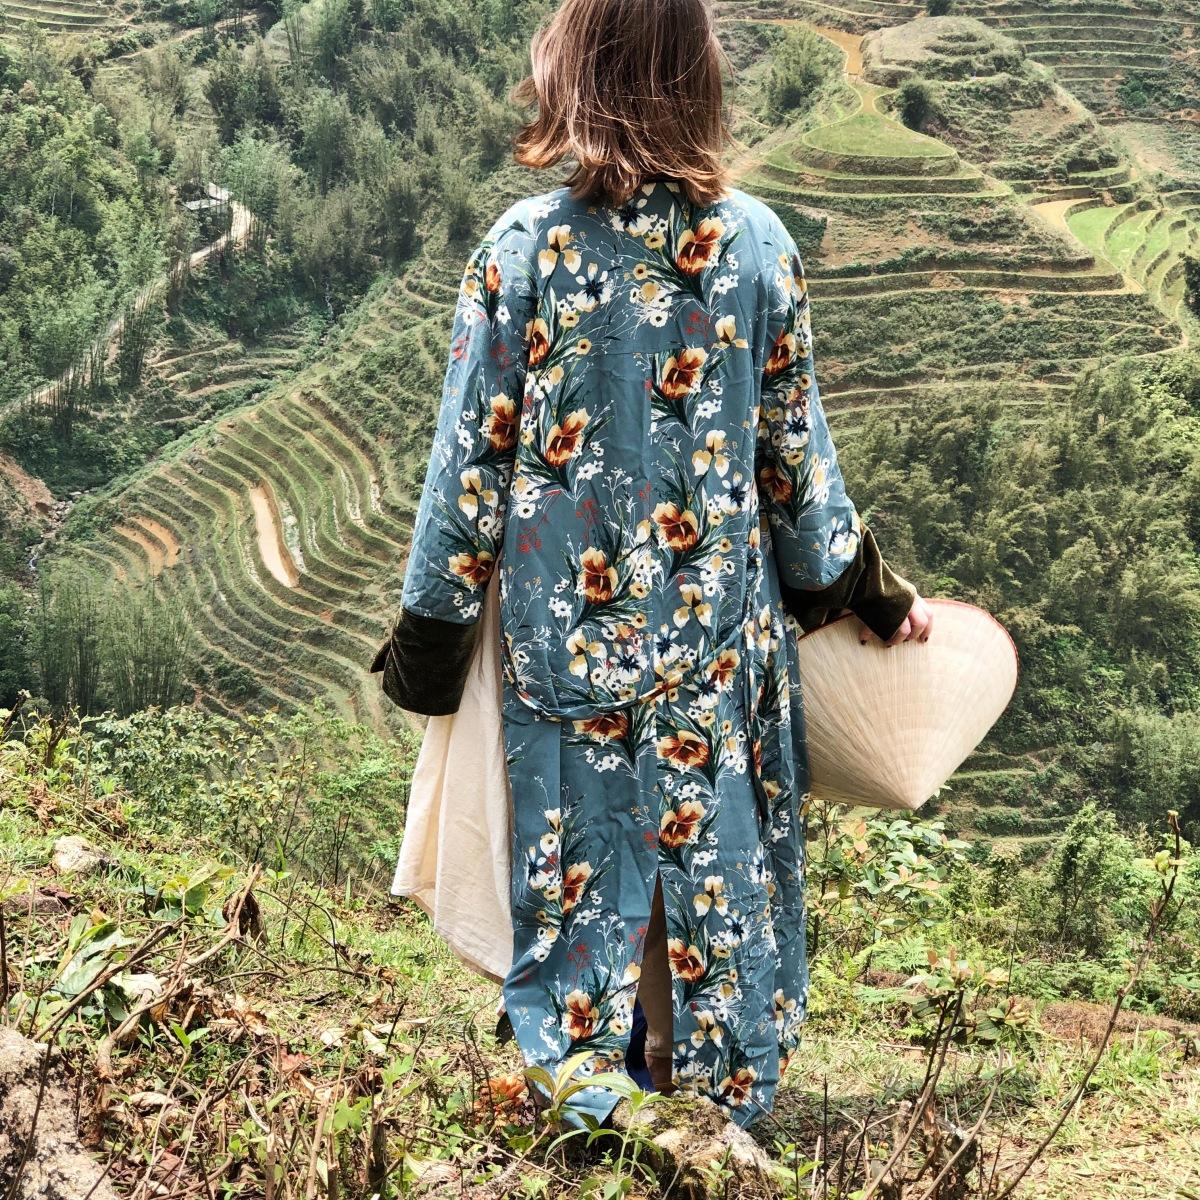 Vietnamese vibes